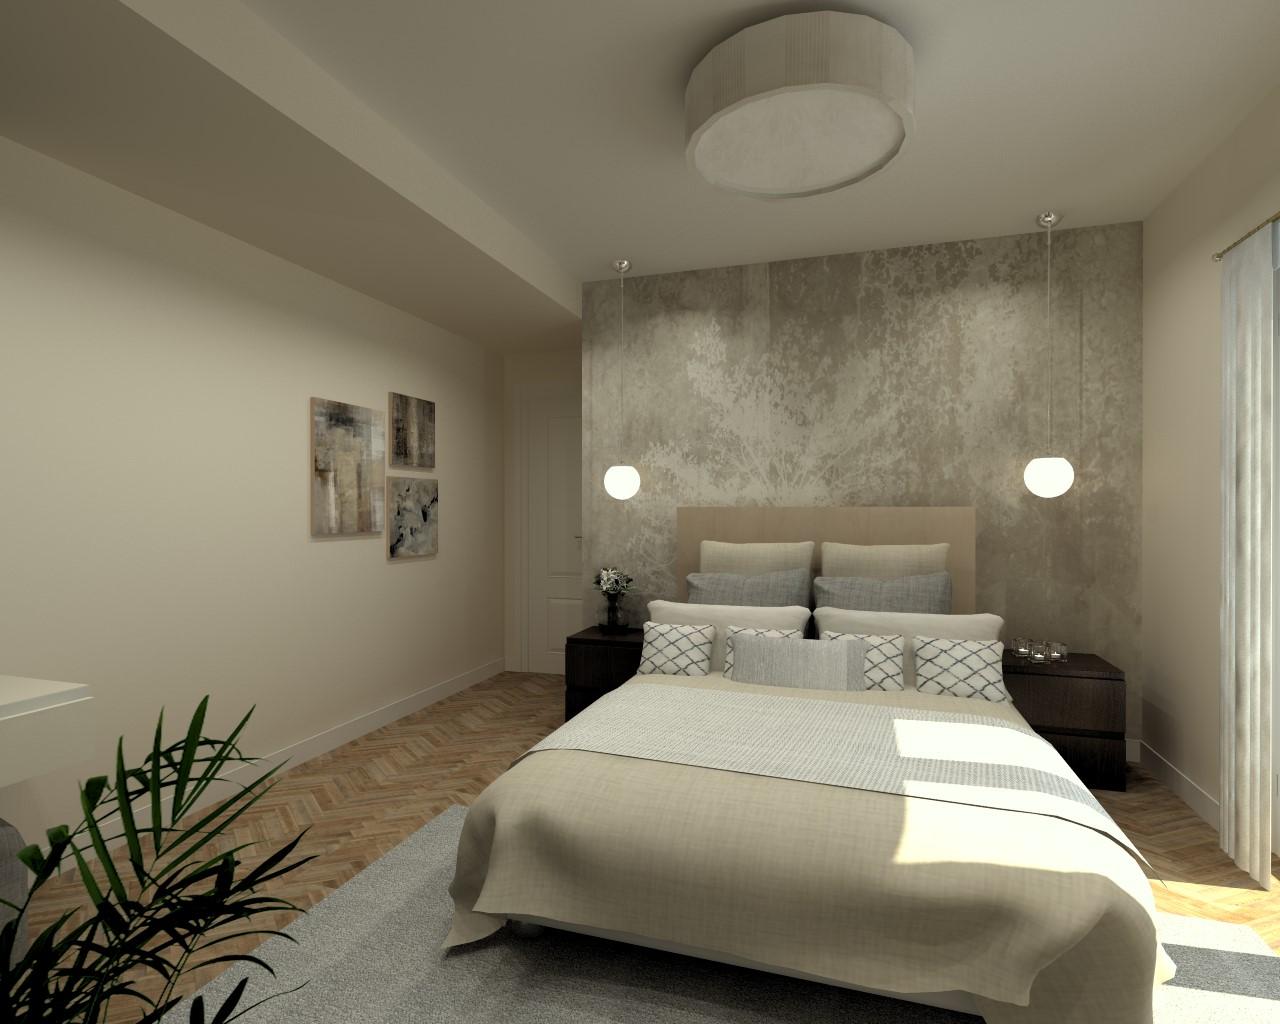 Dormitorio cl sico interiorismo dc dc - Interiorismo dormitorios ...